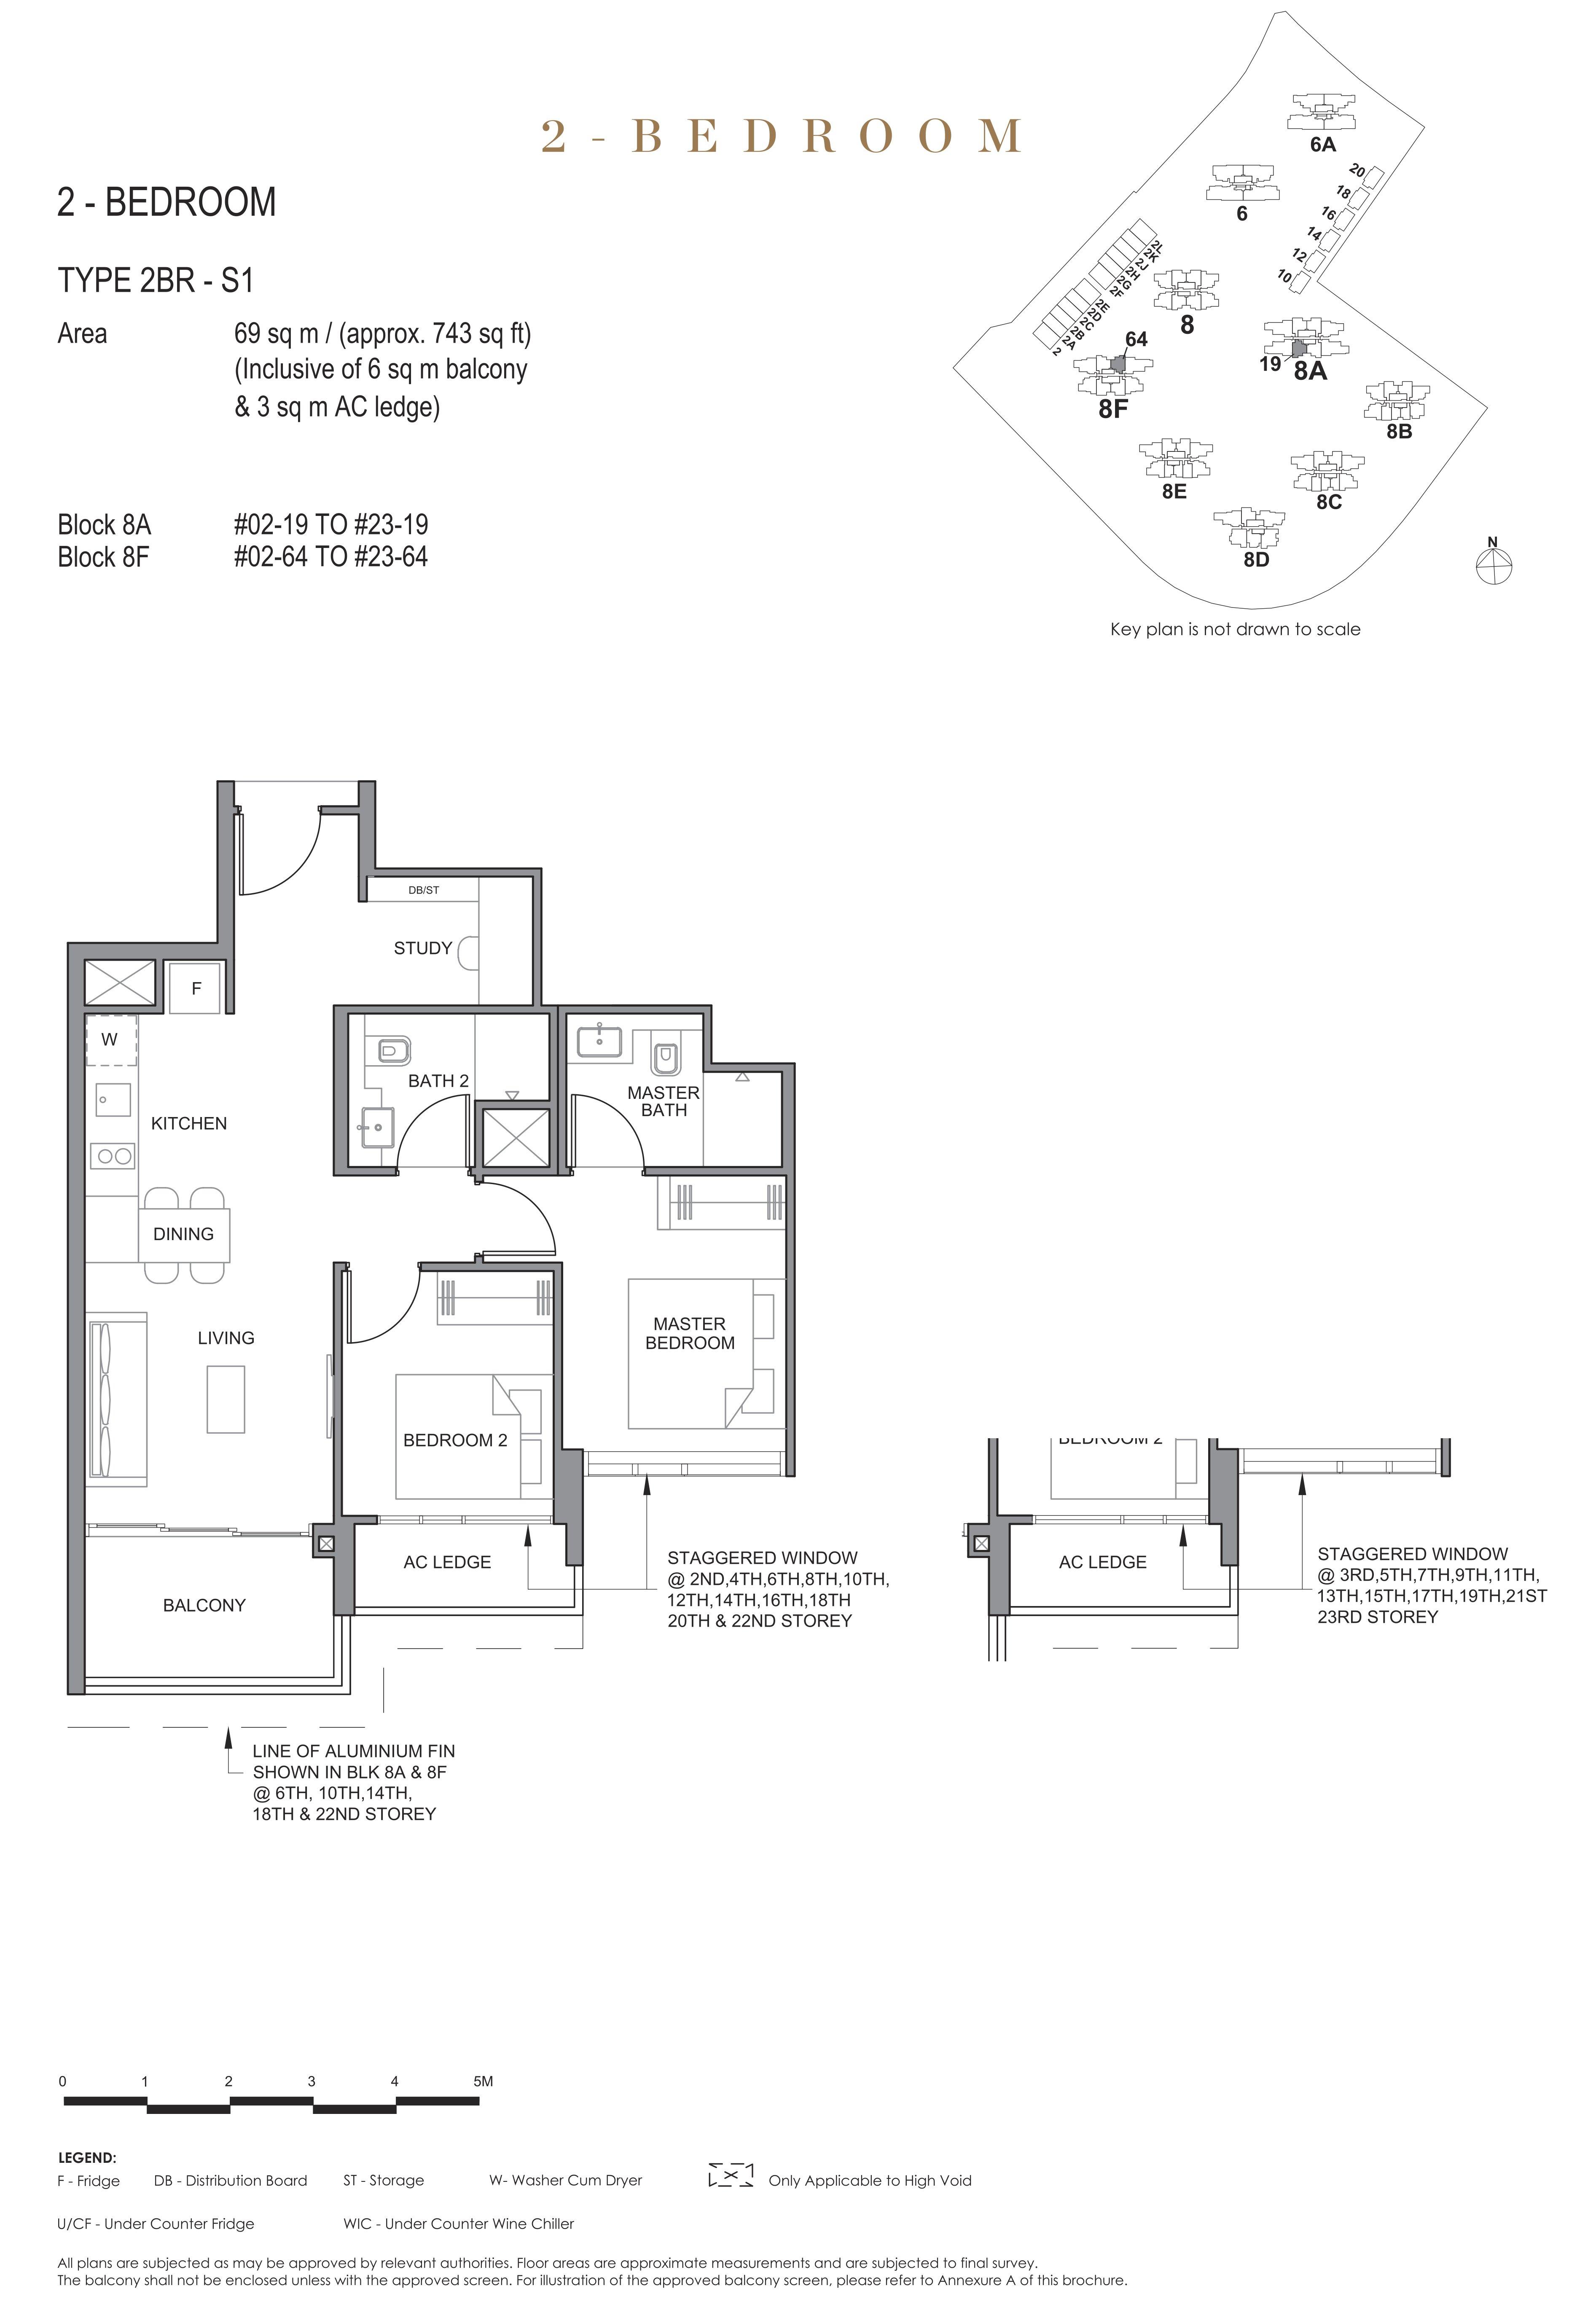 Parc Clematis 锦泰门第 elegance 2 bedroom +study 2卧房+书房 2BR-S1